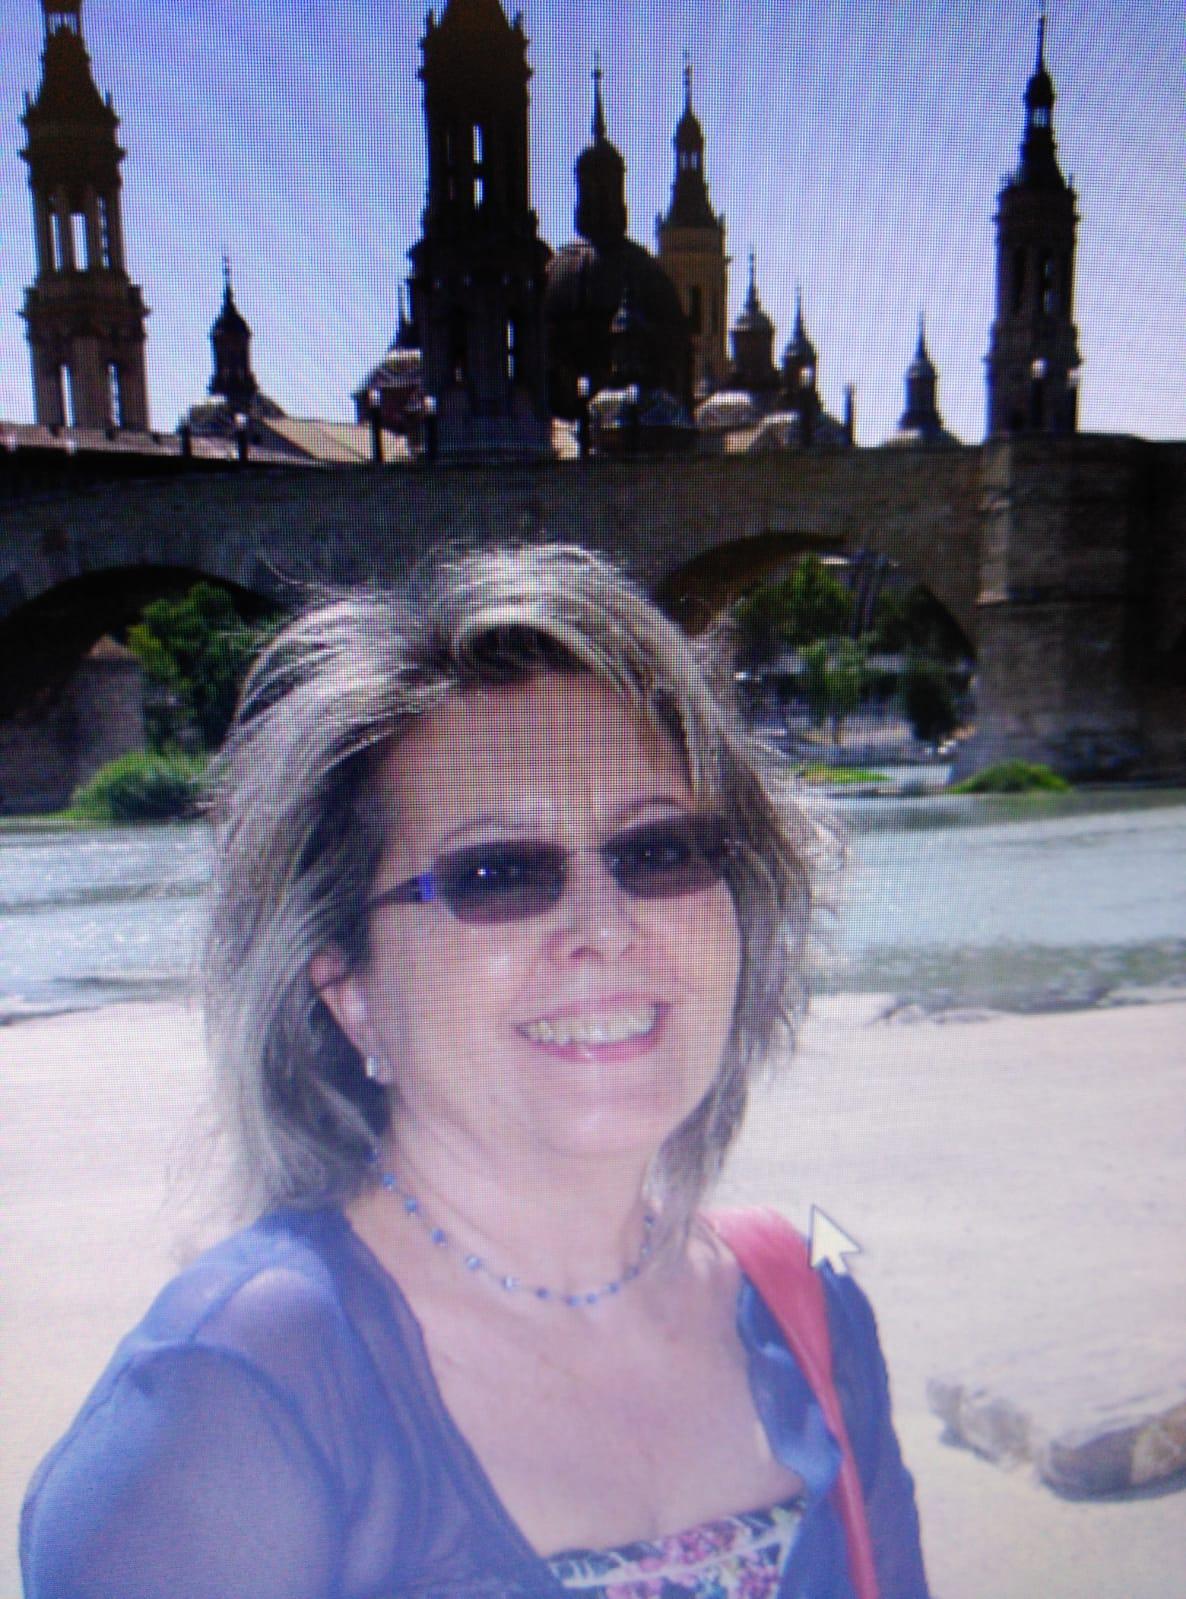 Mª Concepción García de Paso